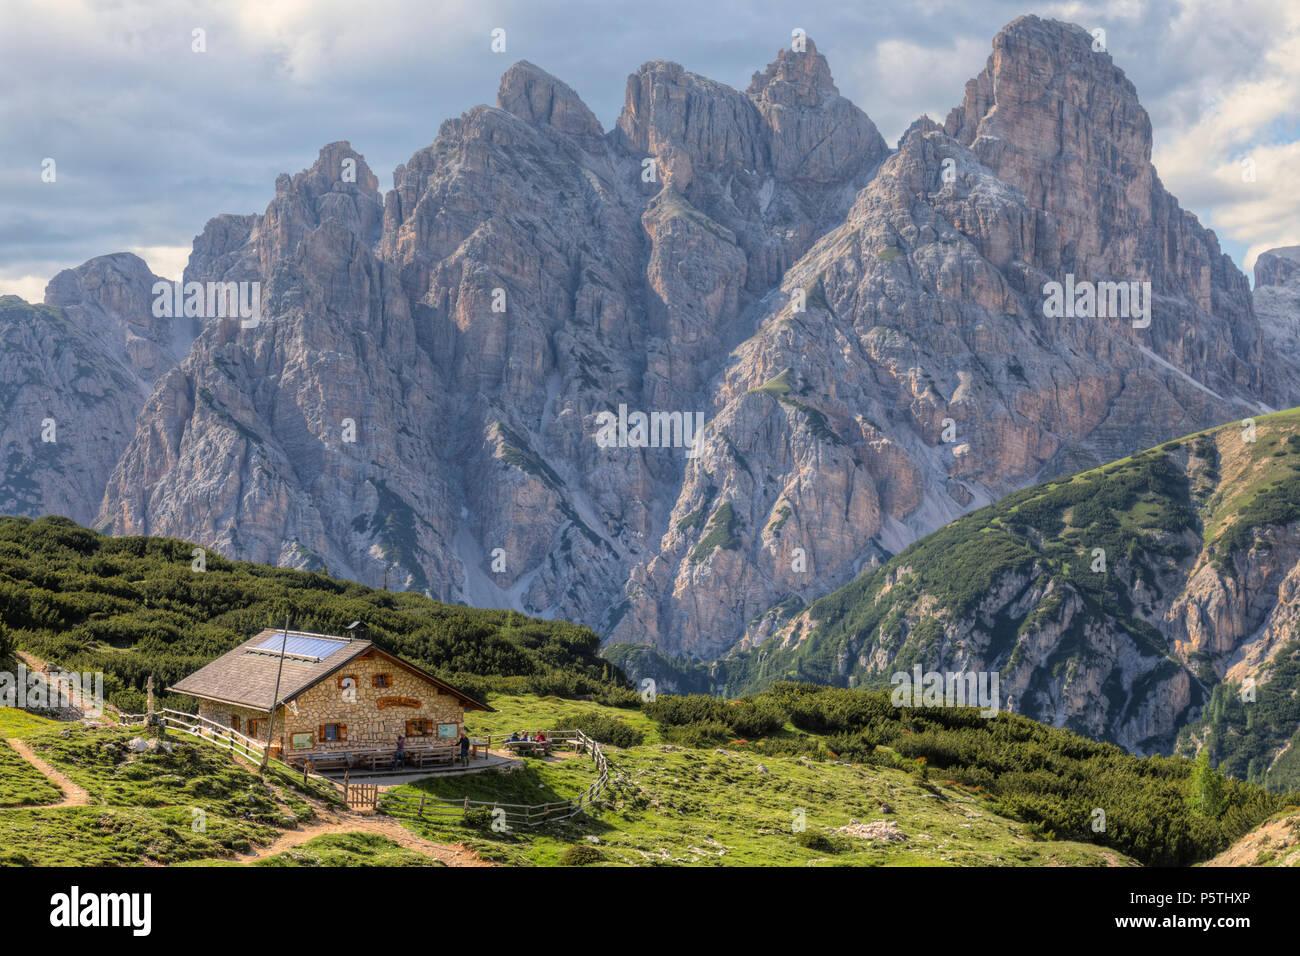 Langalm, torre dei scarperi, Dolomites, Veneto, Belluno, Sexten, Italy, Europe - Stock Image